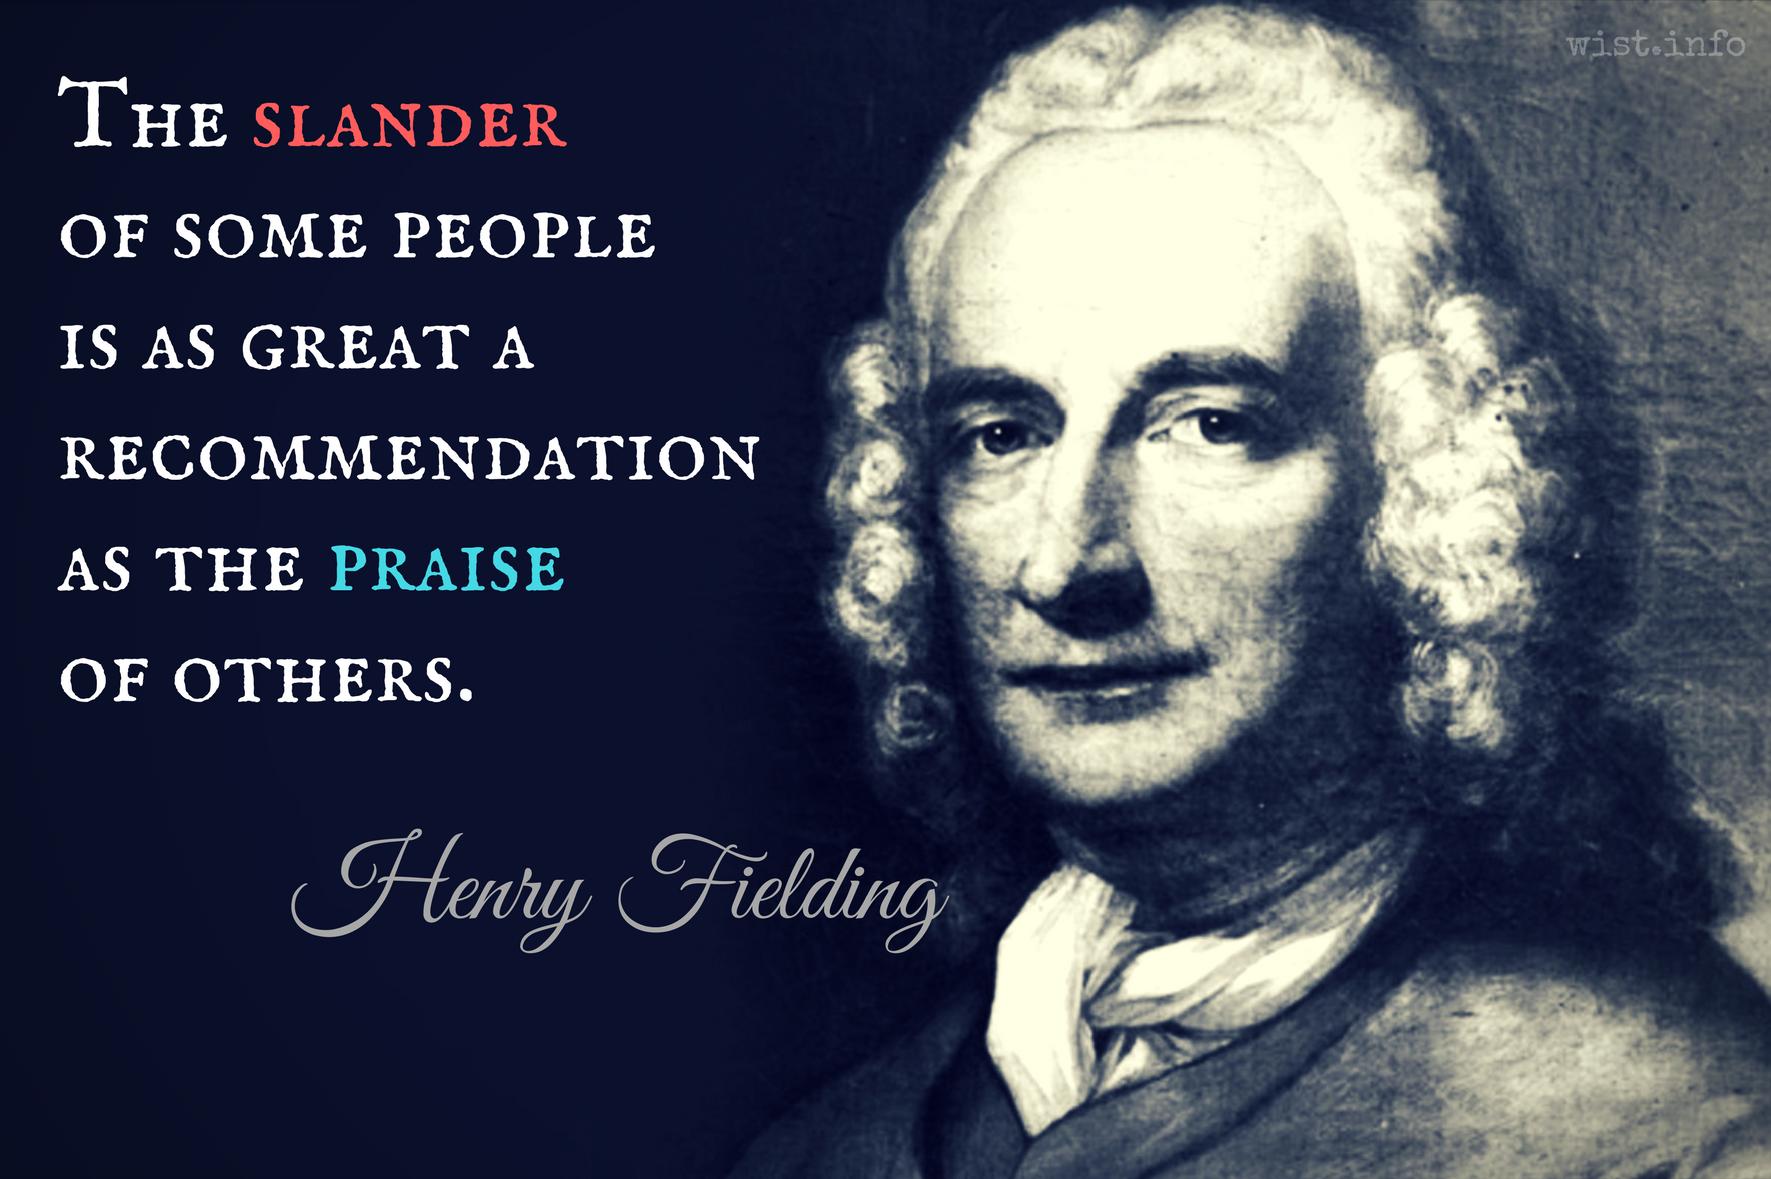 fielding-slander-recommendation-praise-wist_info-quote